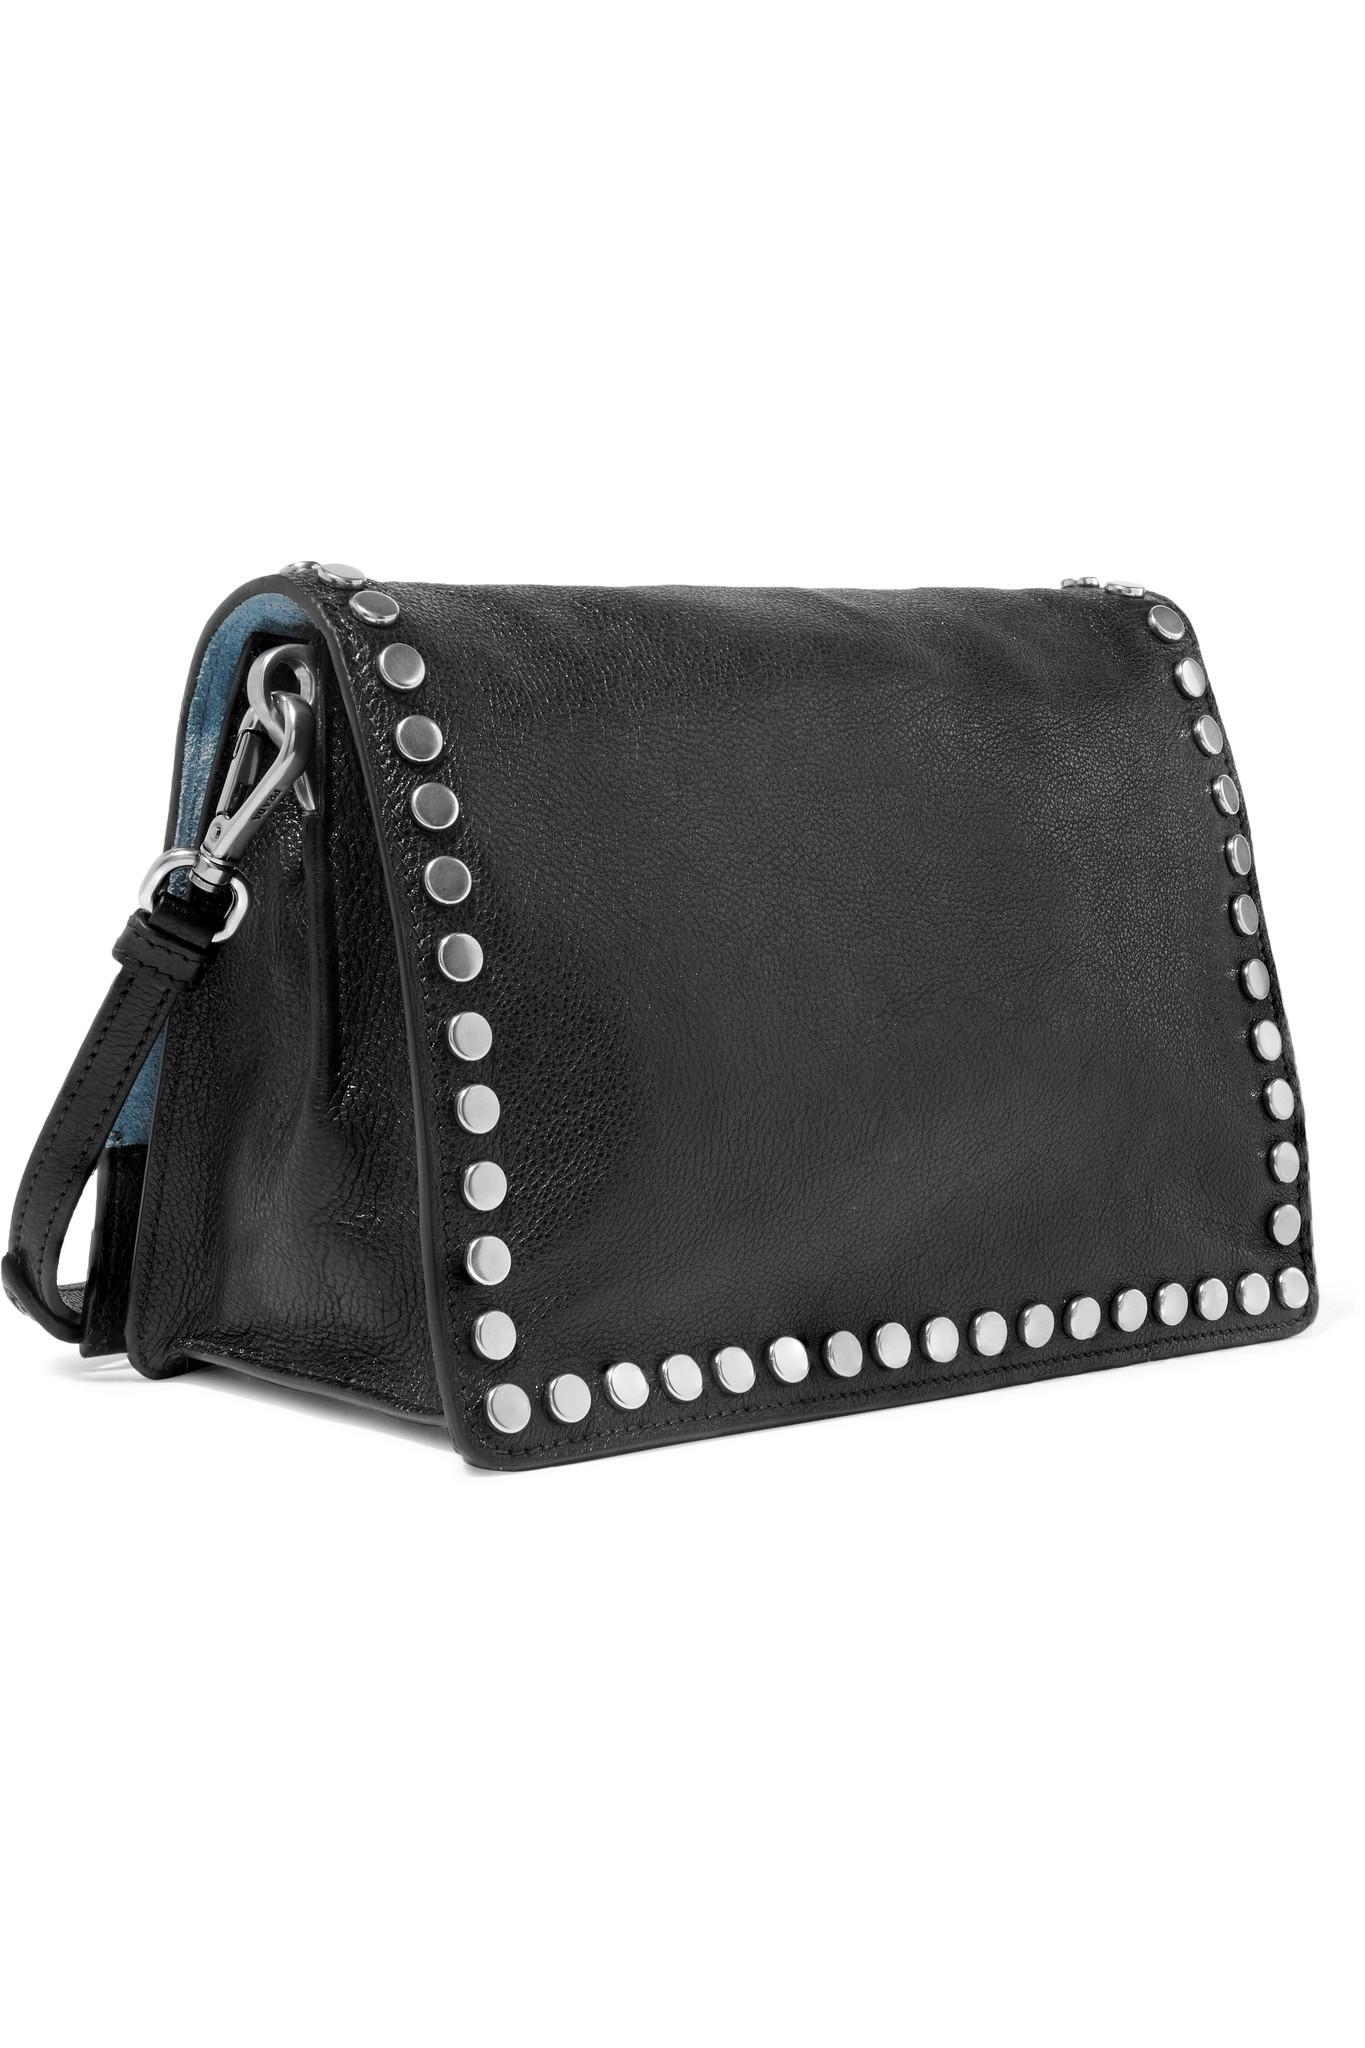 f2c966eaaea0 ... uk prada black etiquette small studded textured leather shoulder bag  lyst. view fullscreen 5b5fb e7ff5